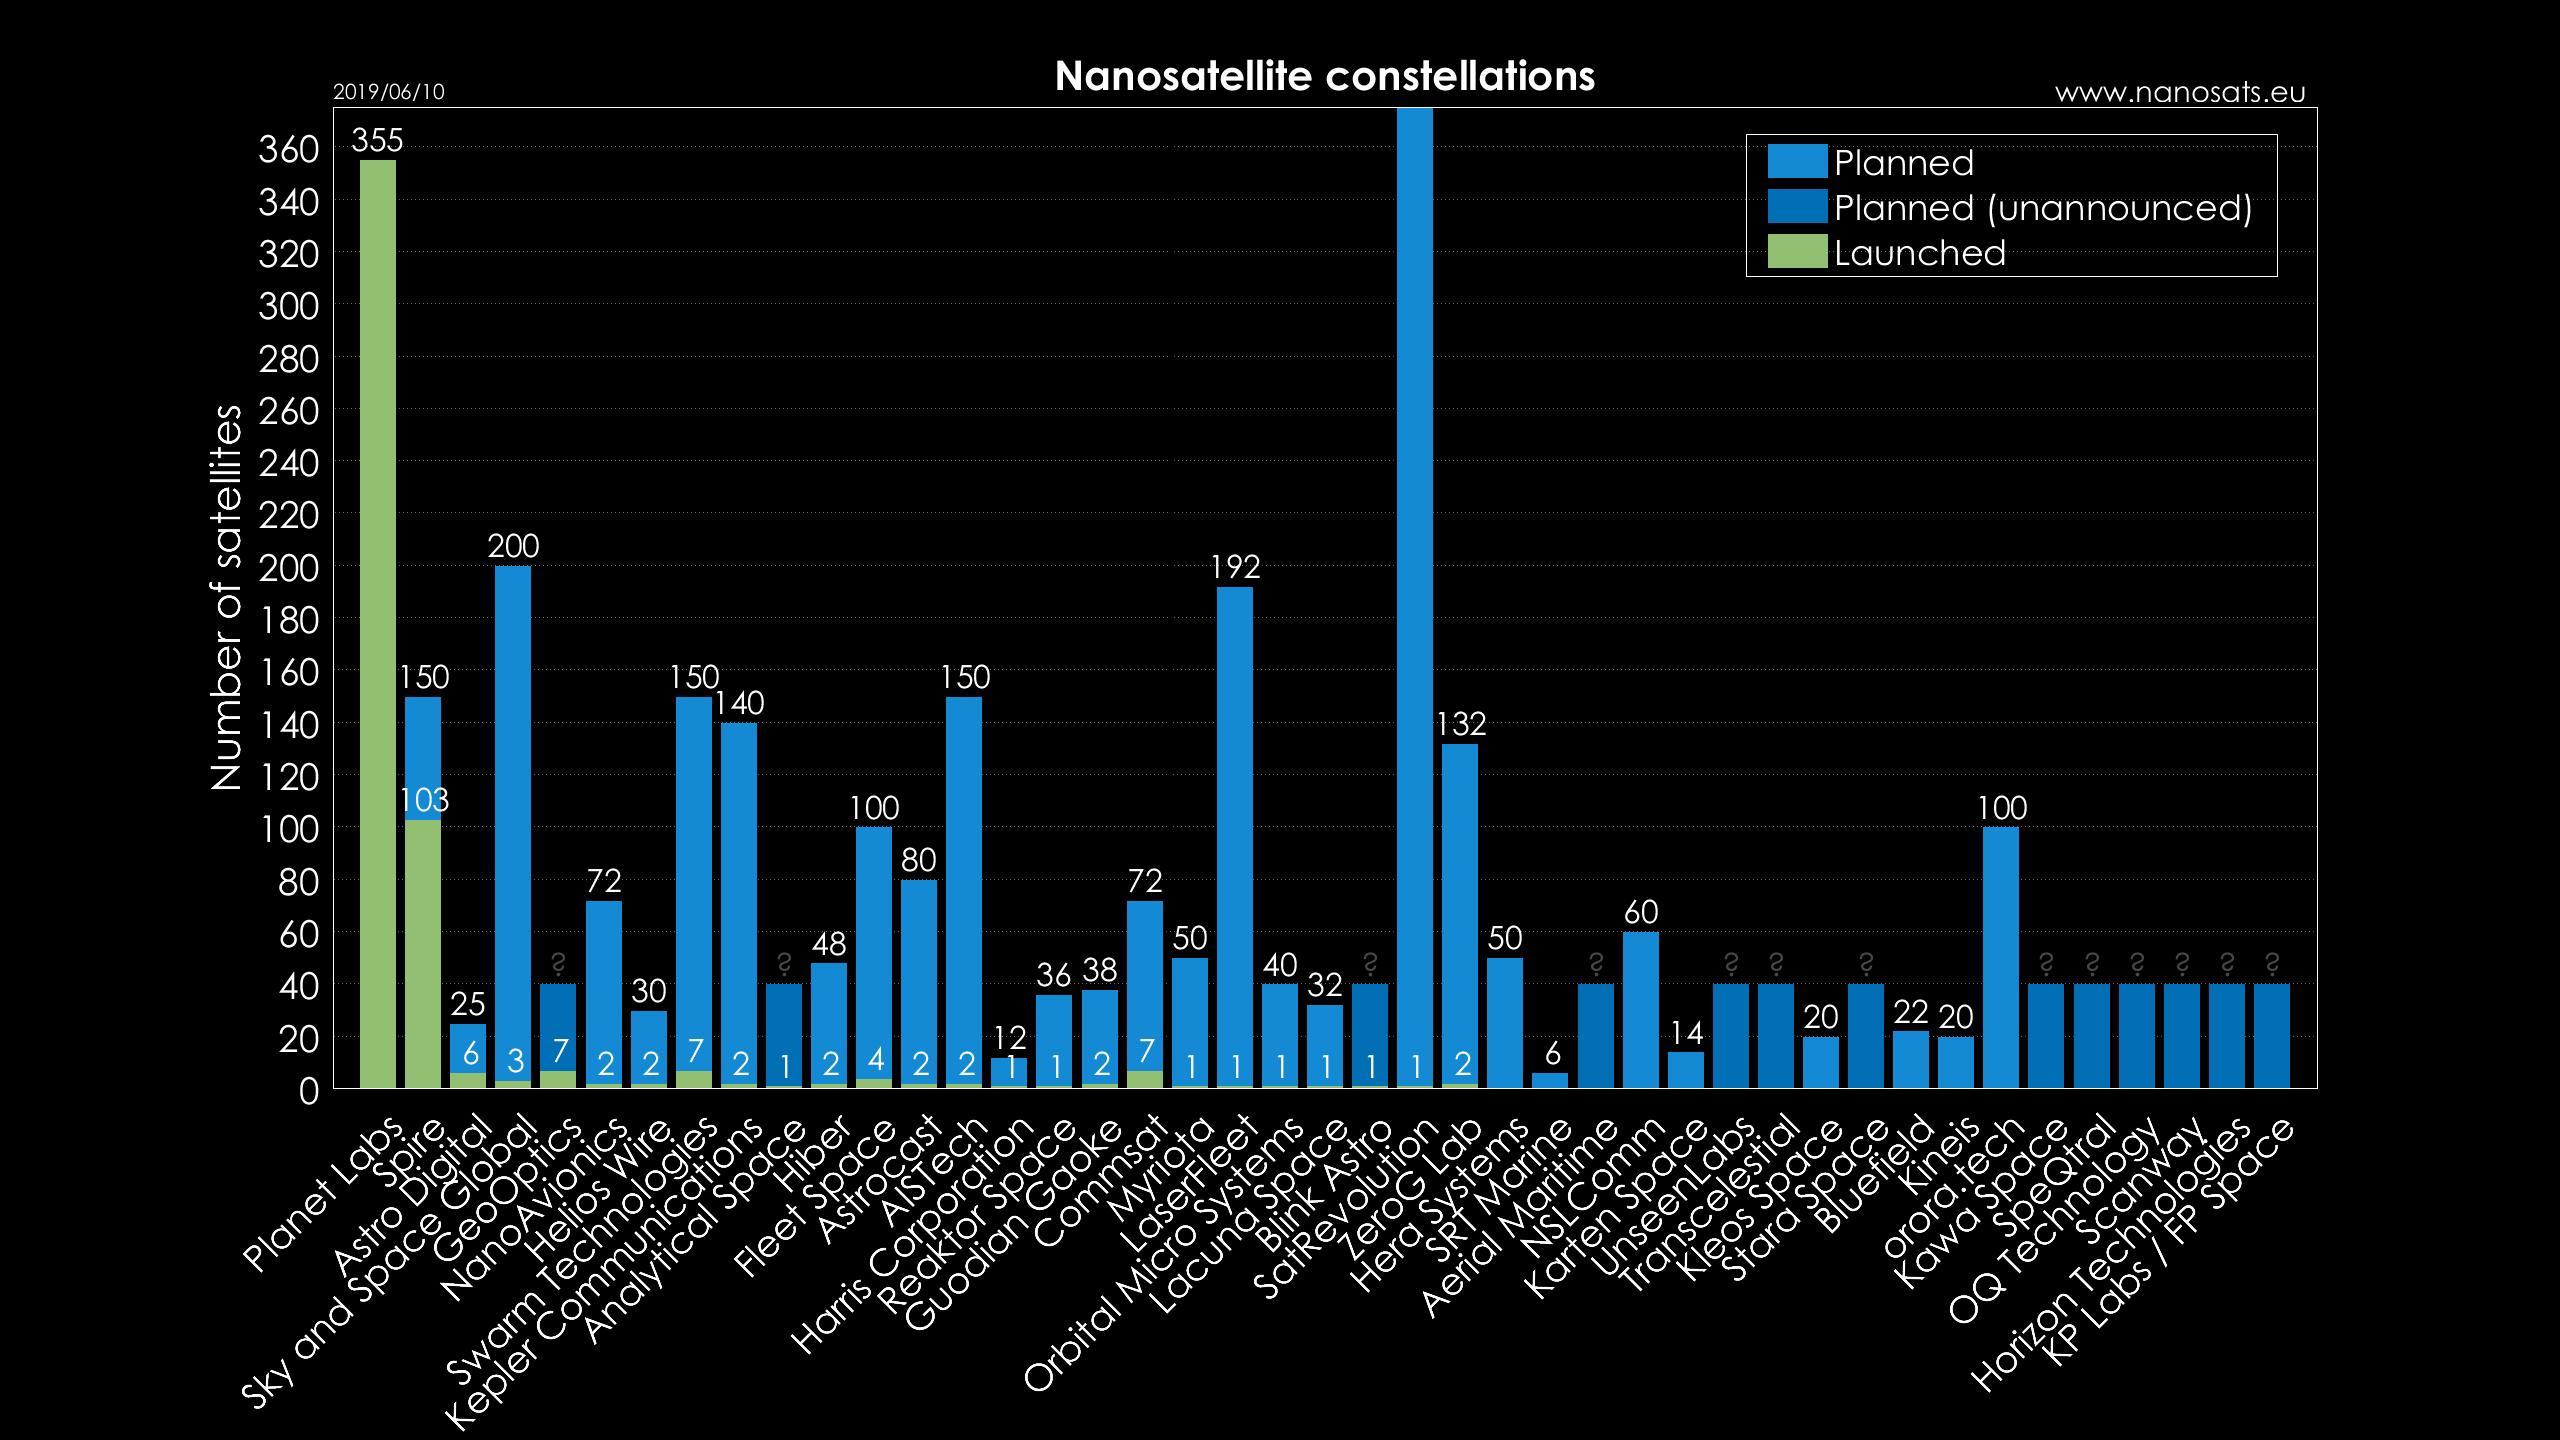 Nanosats Database   Constellations, companies, technologies